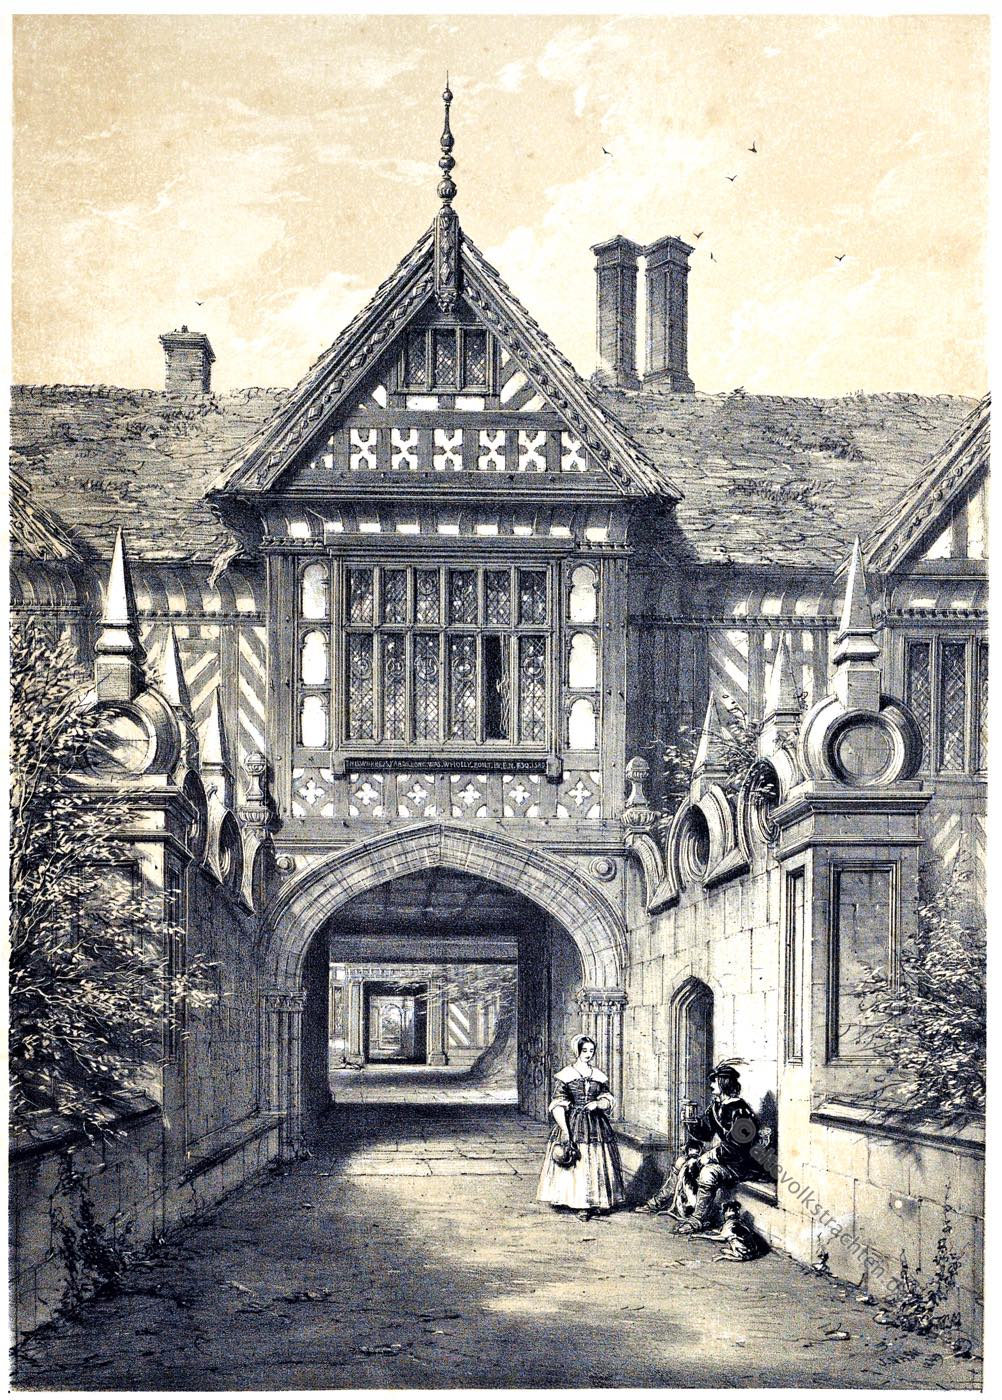 Hofeinfahrt, Speke, Hall, Manson, Lancashire, Tudor, Architektur, Elisabethanisch, Renaissance, Joseph Nash, Tudorstil